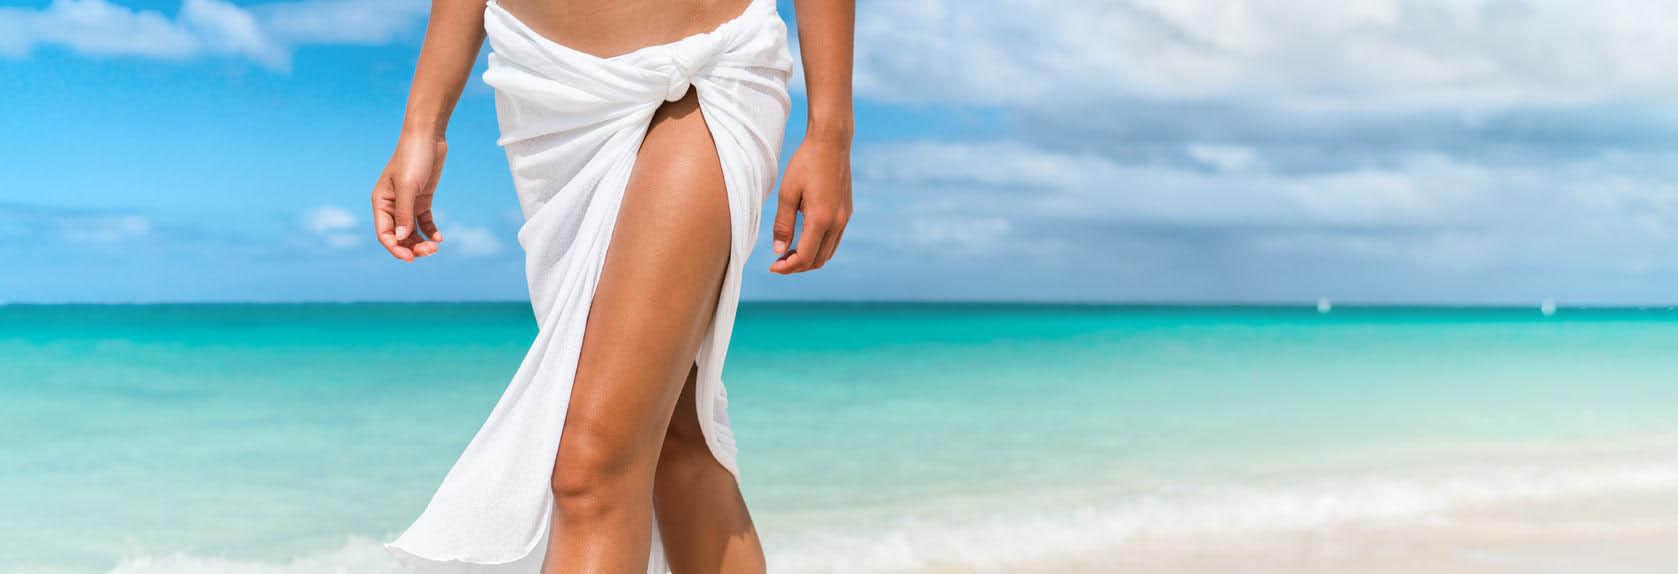 Lumen Laser Center, Lumen Laser, Health, weight loss, fitness, beach body, contouring, body contour